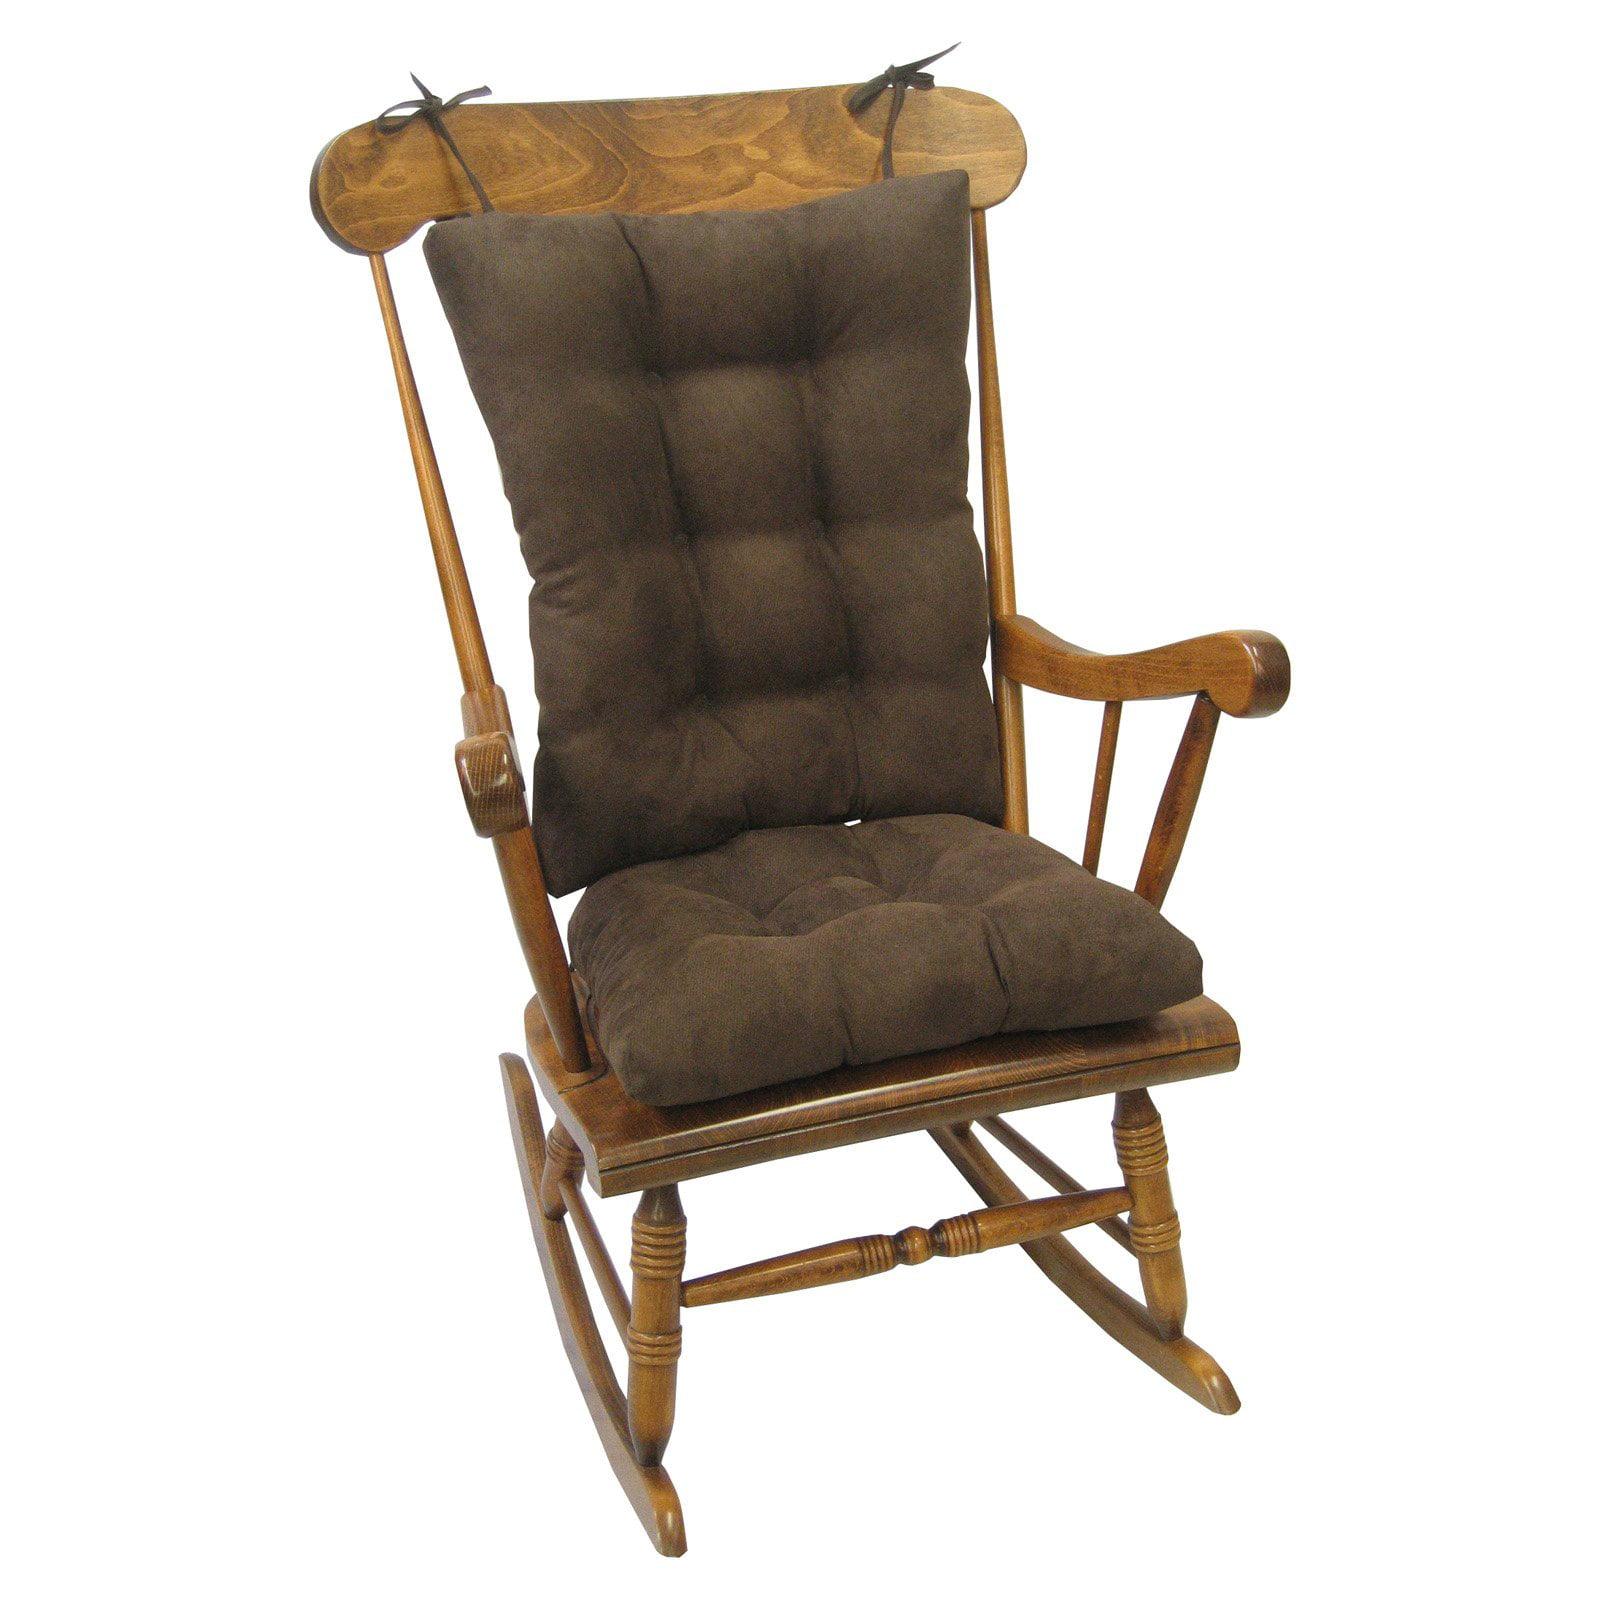 Super Gripper Jumbo Rocking Chair Cushions Nouveau Walmart Com Uwap Interior Chair Design Uwaporg